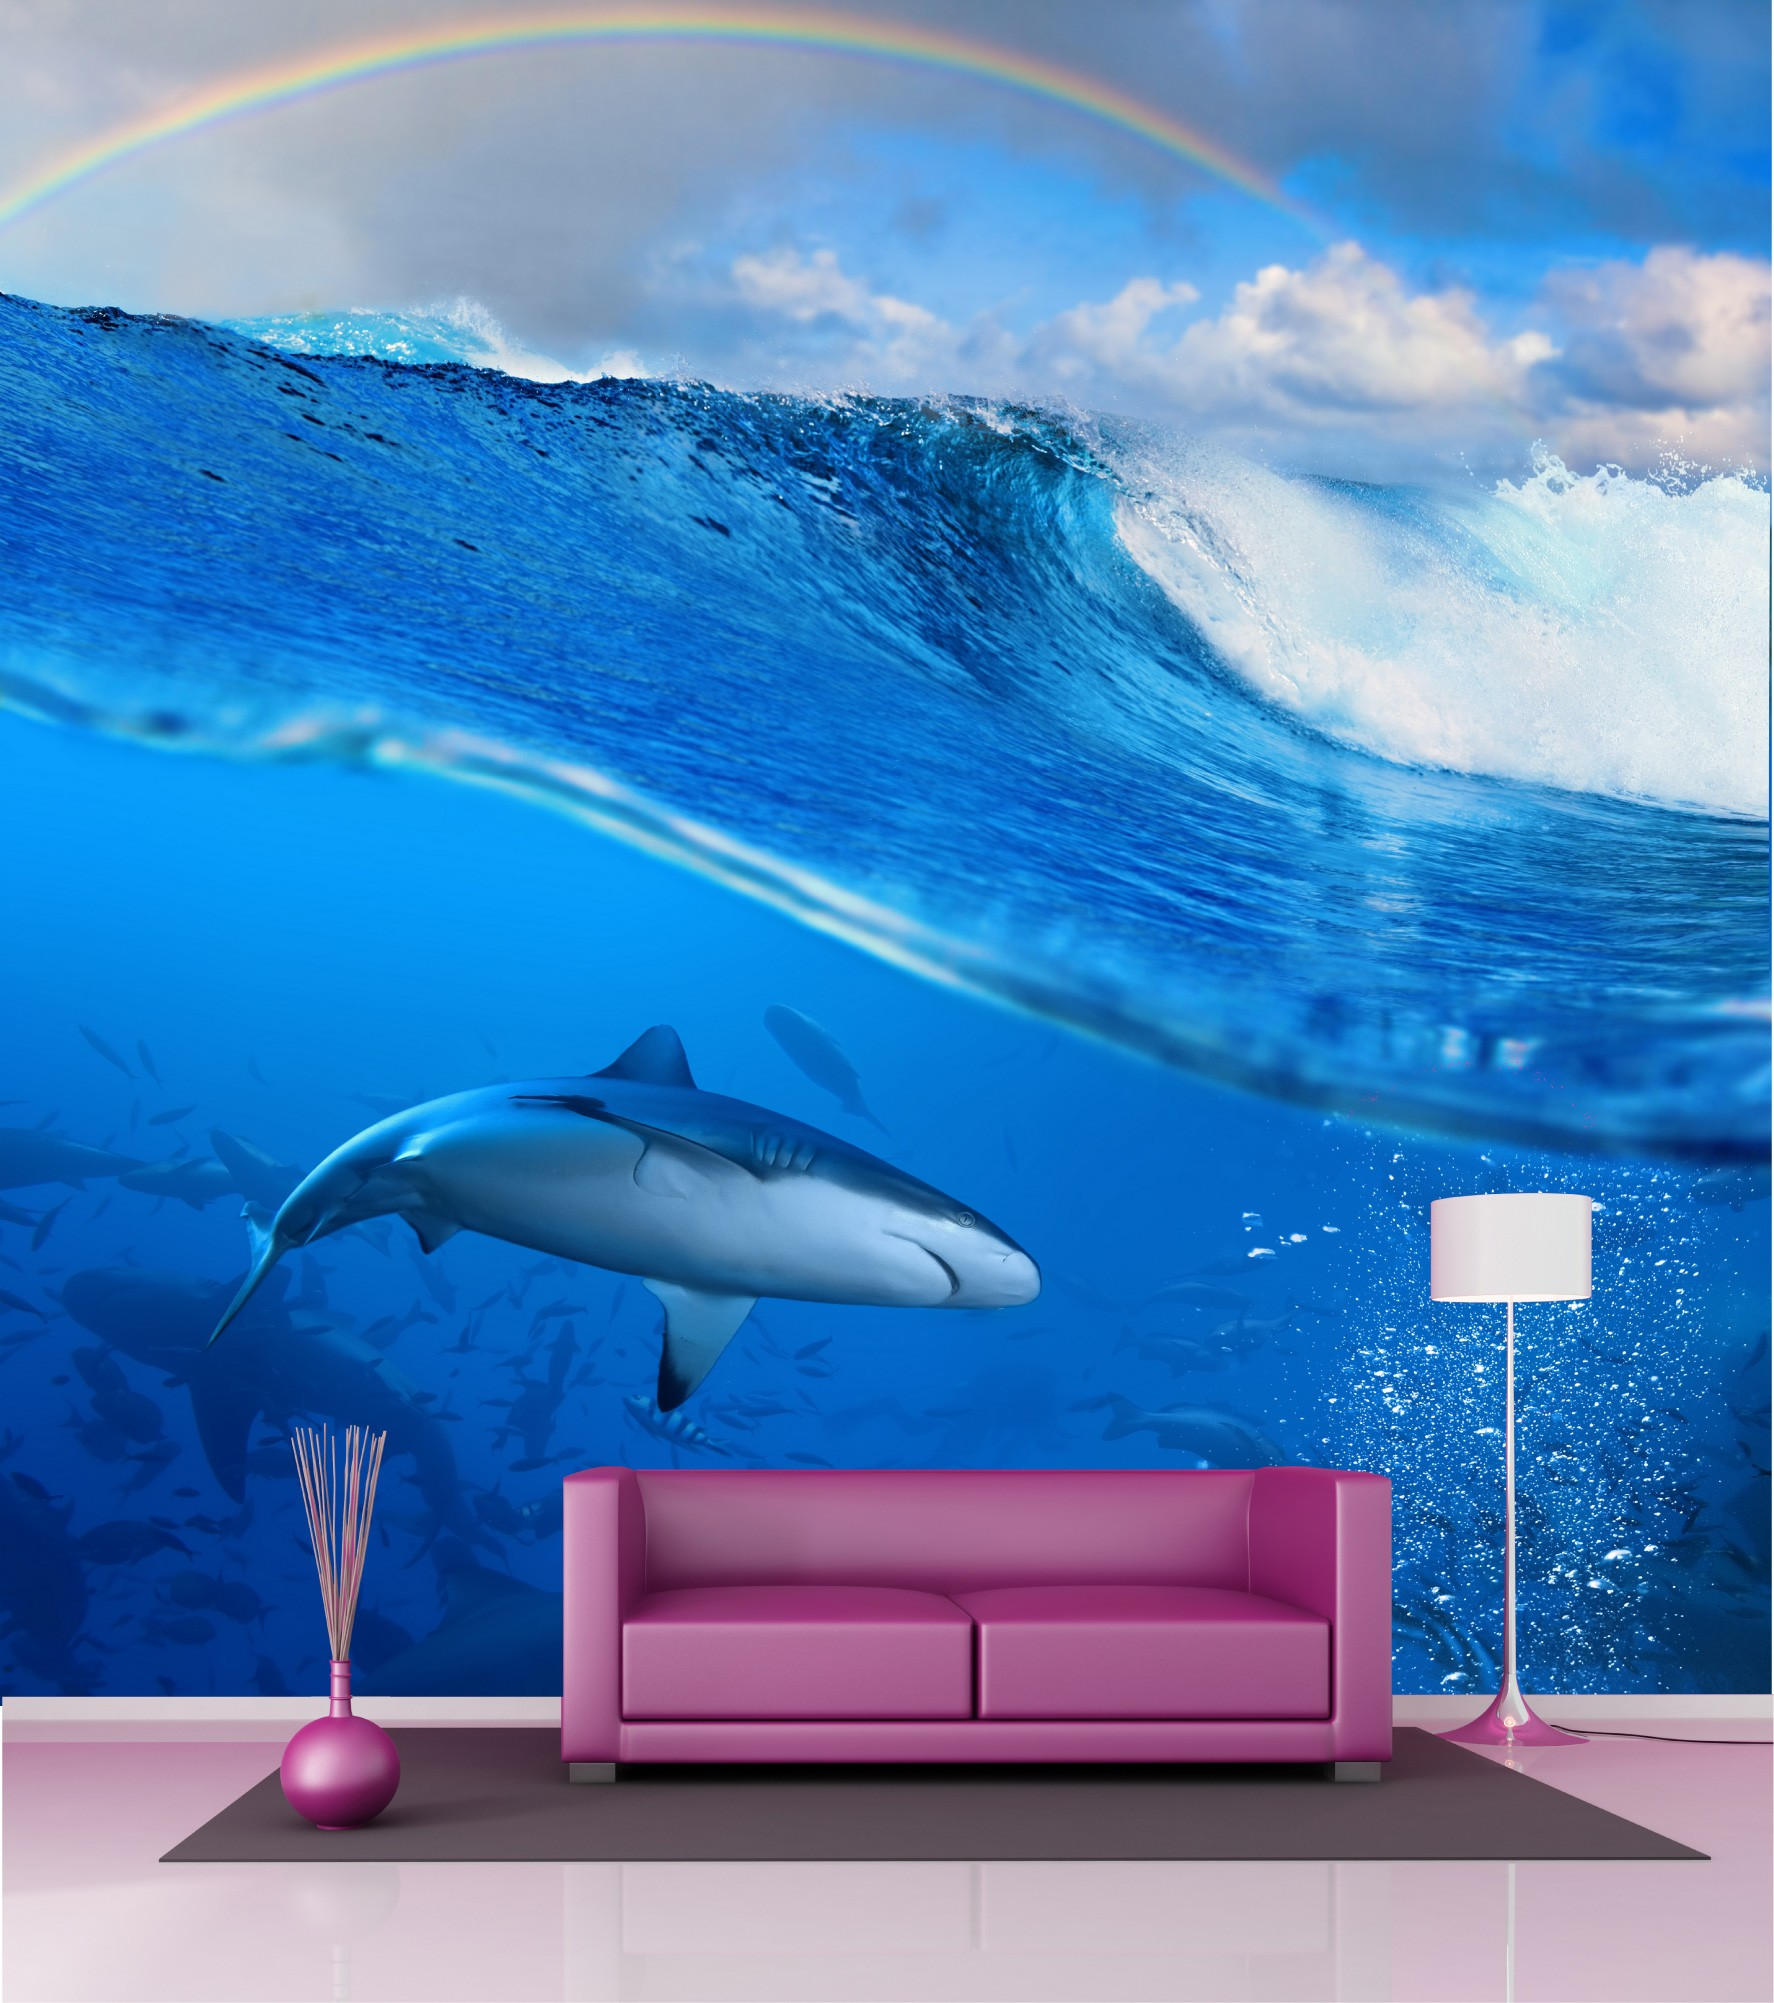 Poster gant tapisser cool free poster xxl mural leroy for Leroy merlin clermont ferrand clermont ferrand